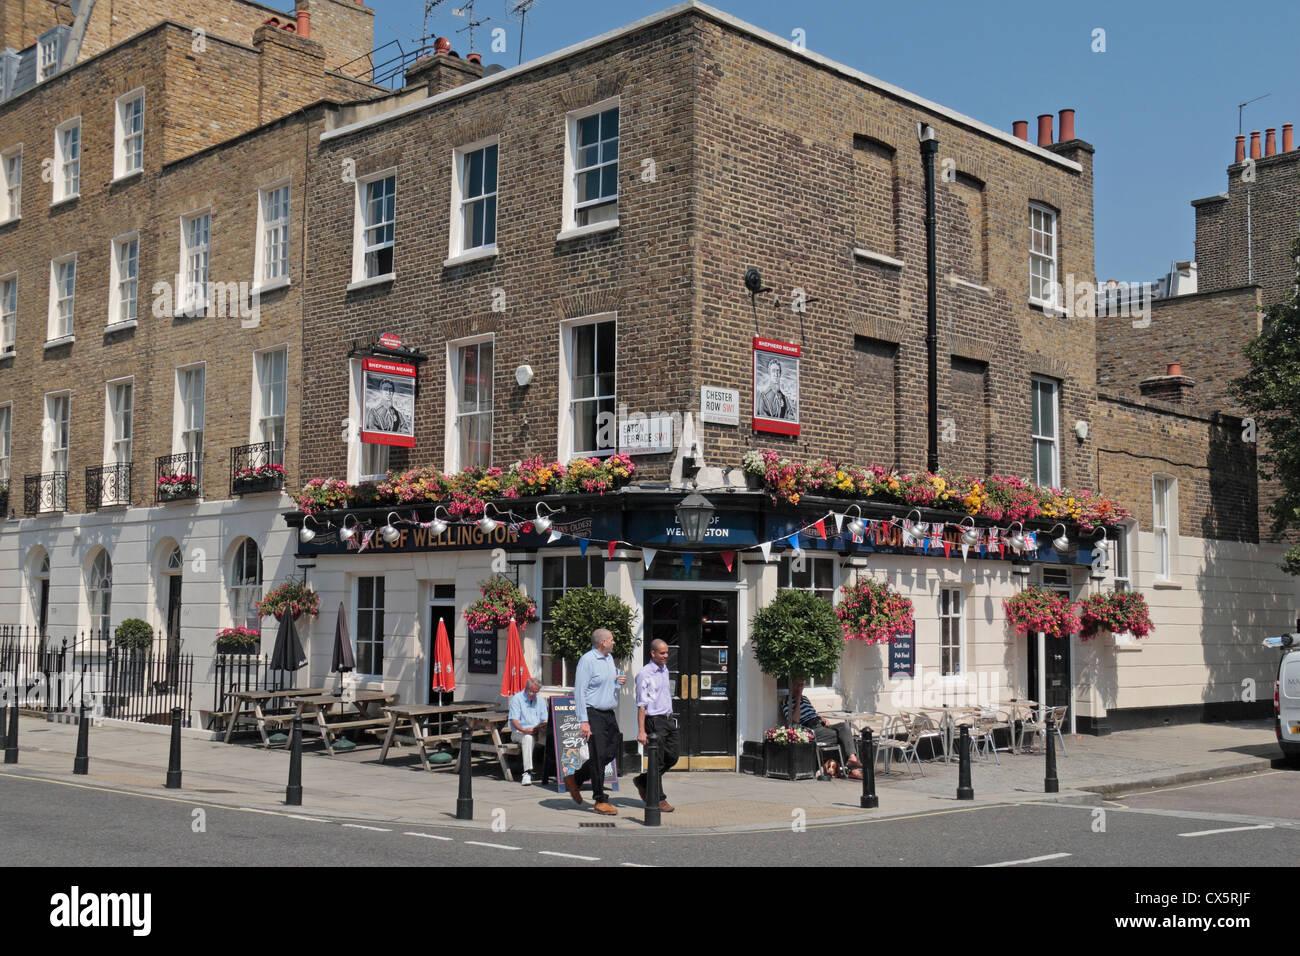 The Duke of Wellington public house, Eaton Terrace, City of Westminster, London, SW1, UK. - Stock Image